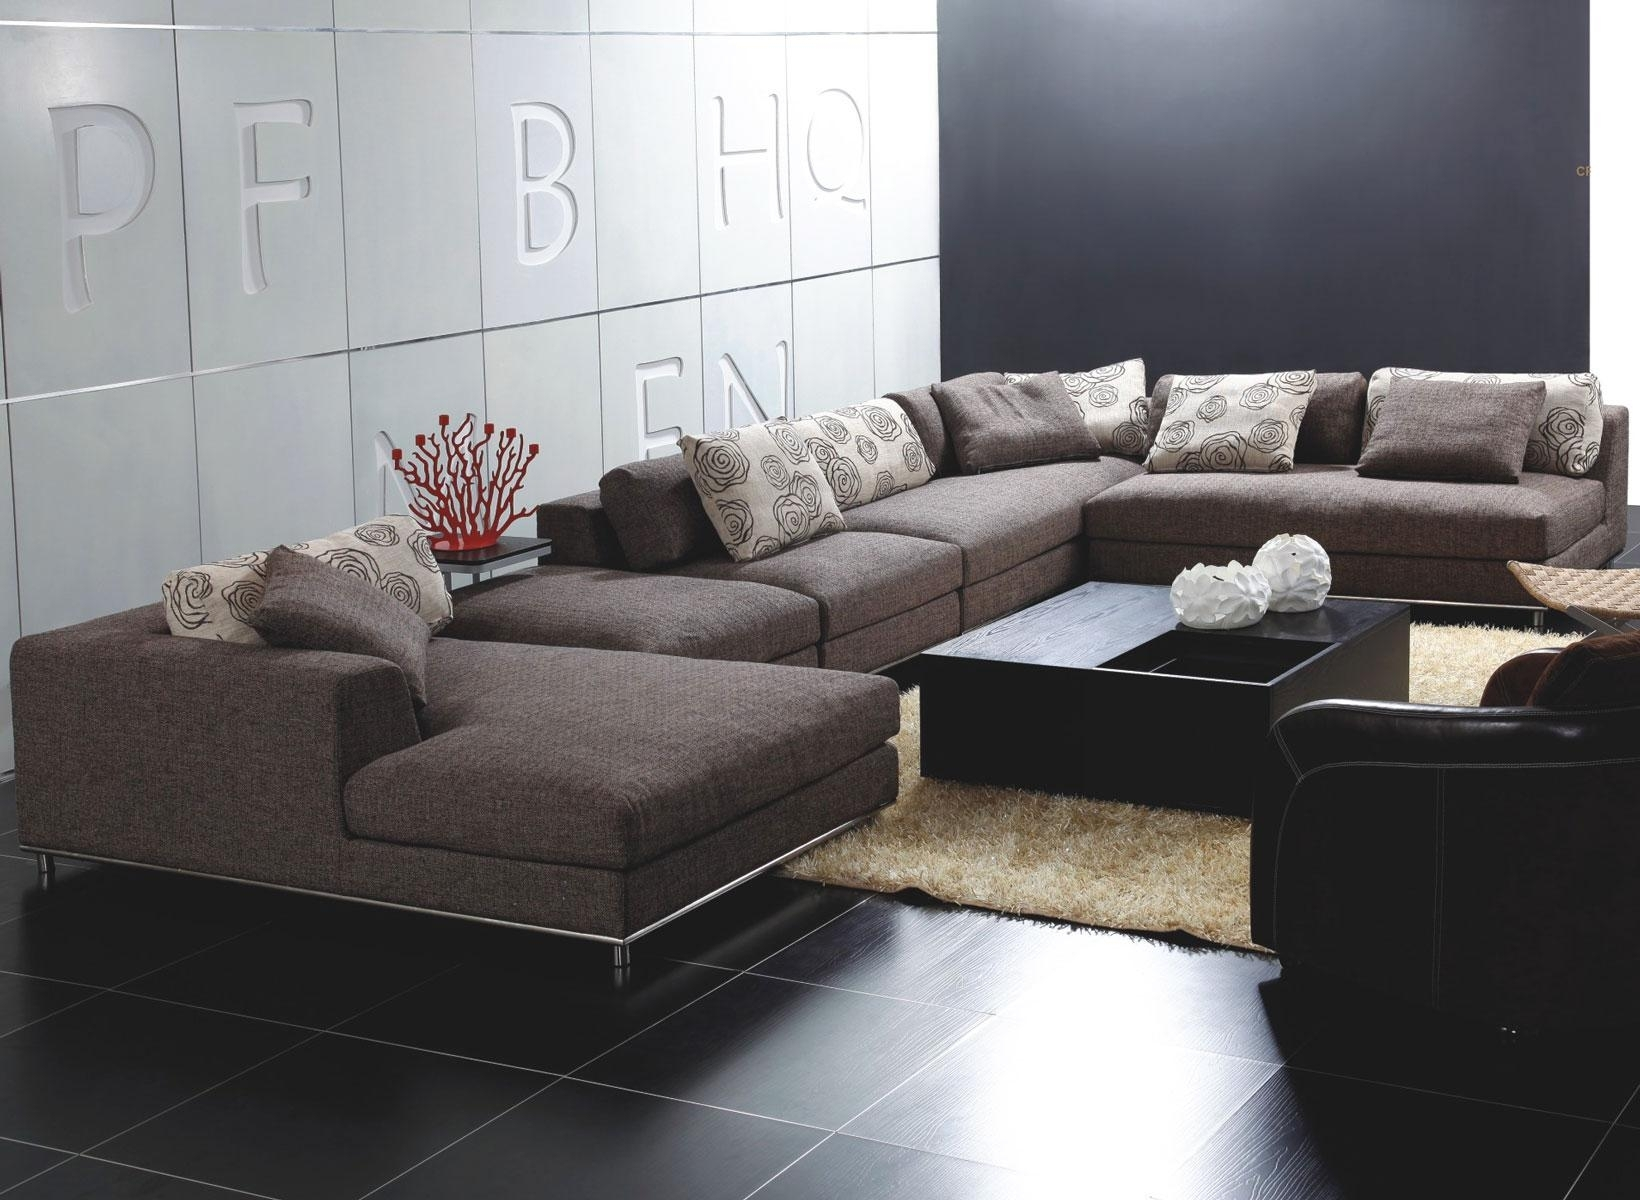 Furniture : Kijiji Used Sofa Bed Toronto Leather Sofa Kijiji Gta Within Gta Sectional Sofas (View 7 of 10)